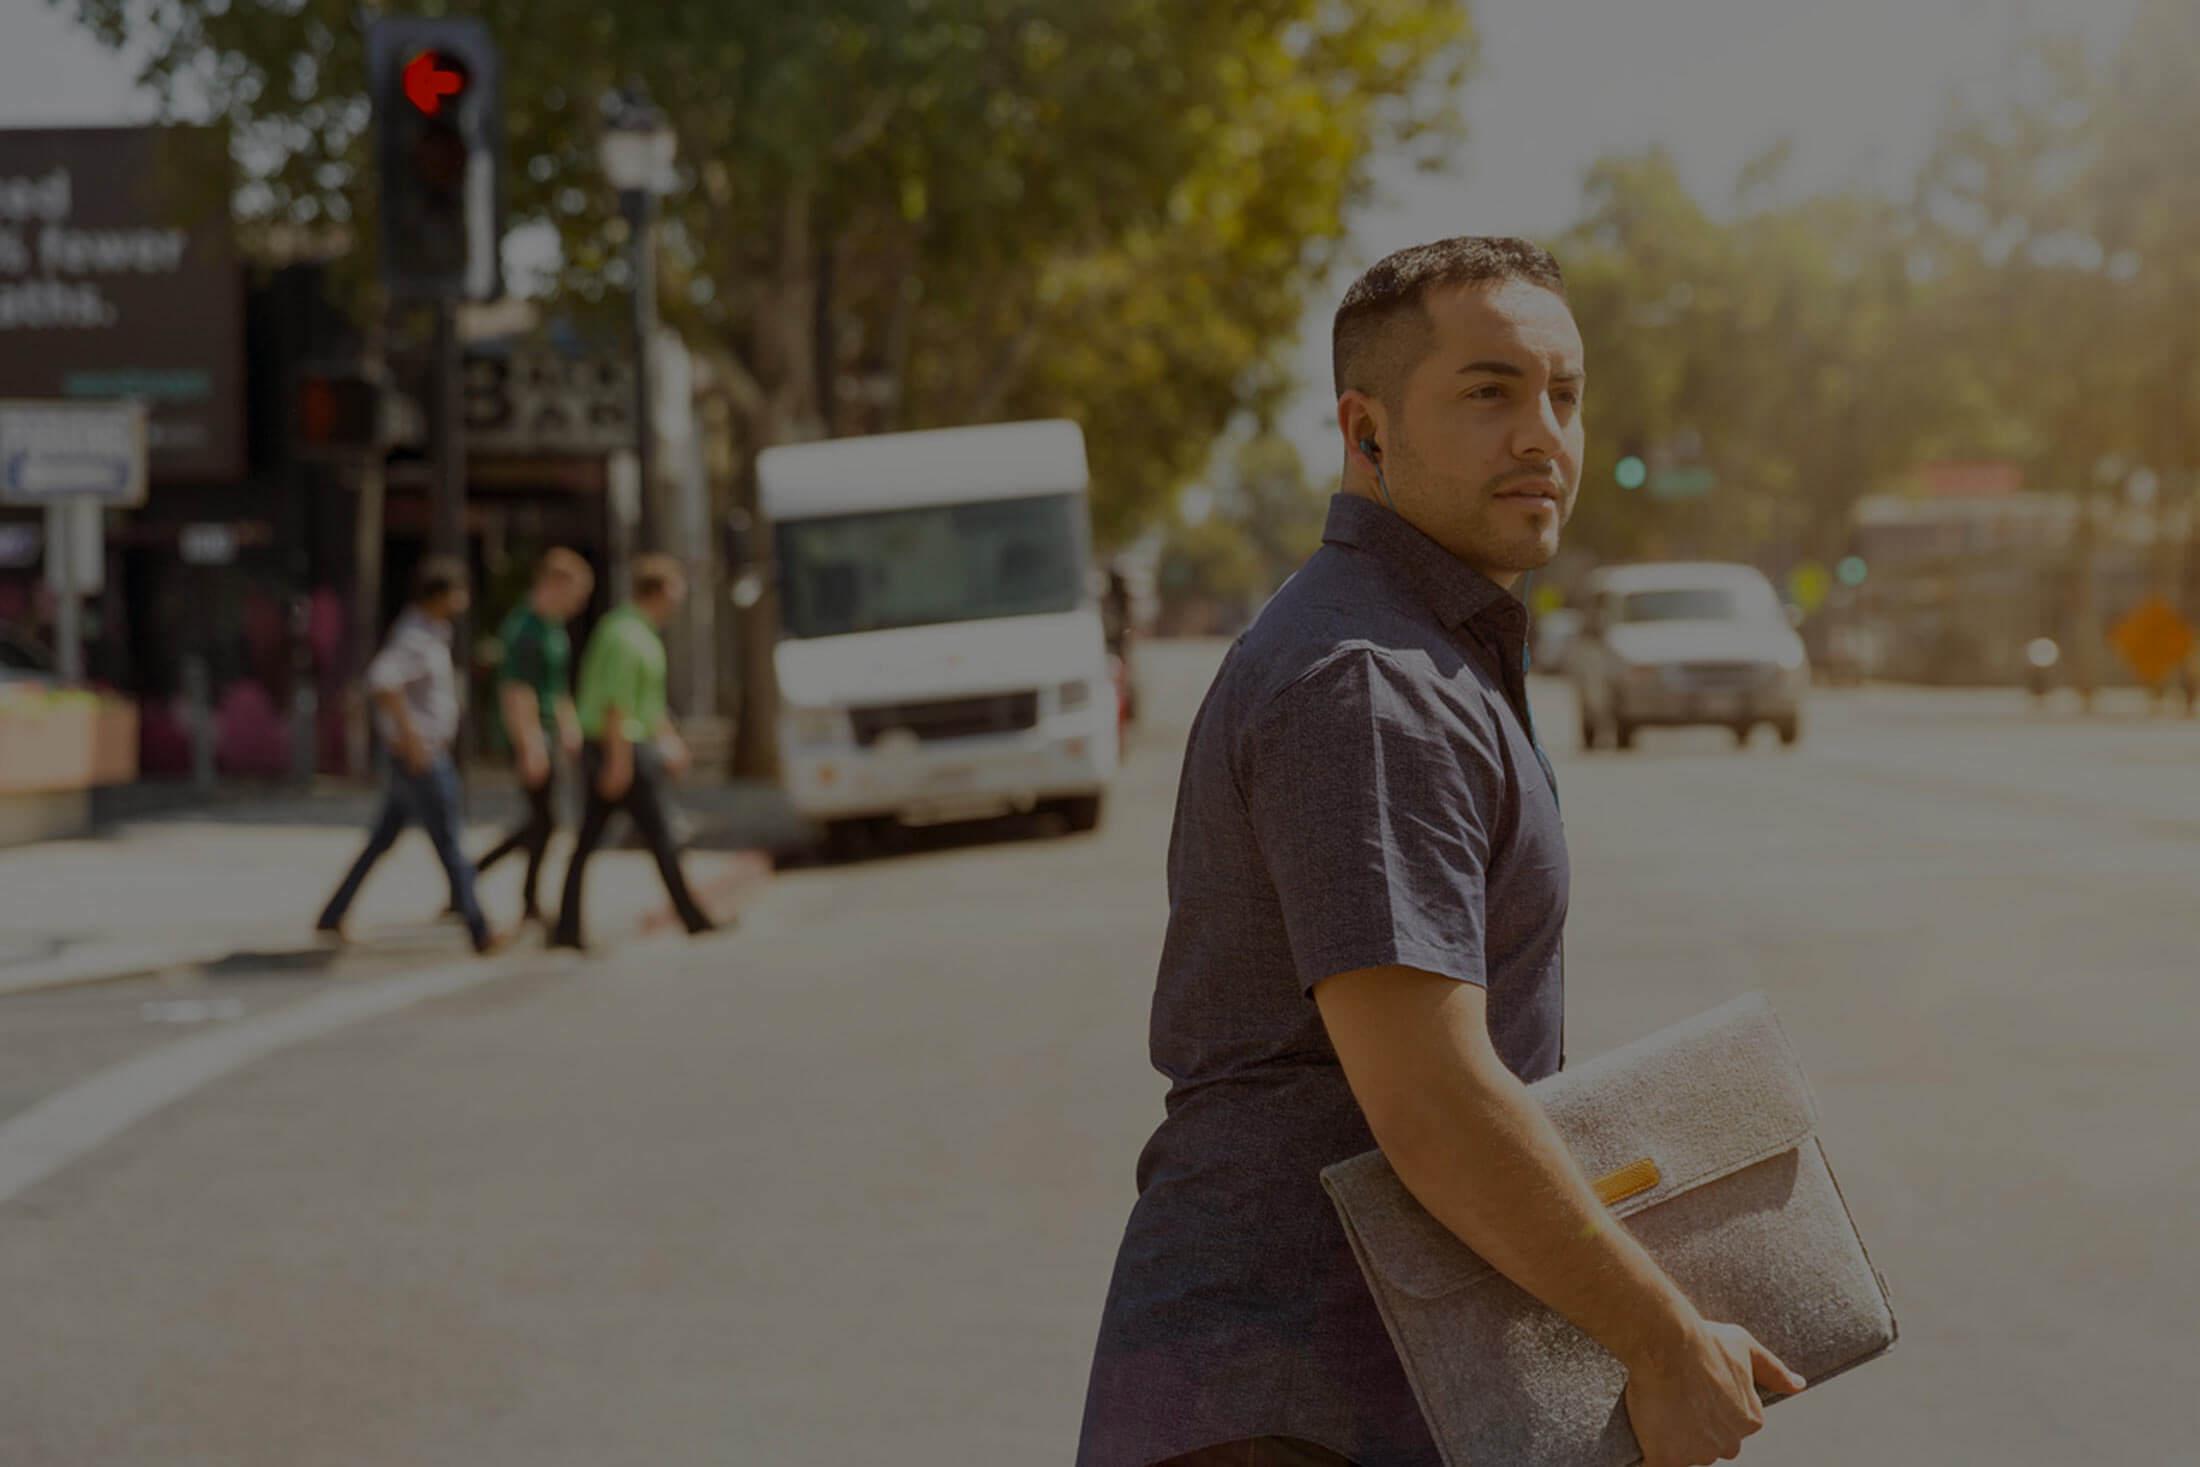 Pole emploi - offre emploi Chauffeur poids lourd (H/F) - Nice